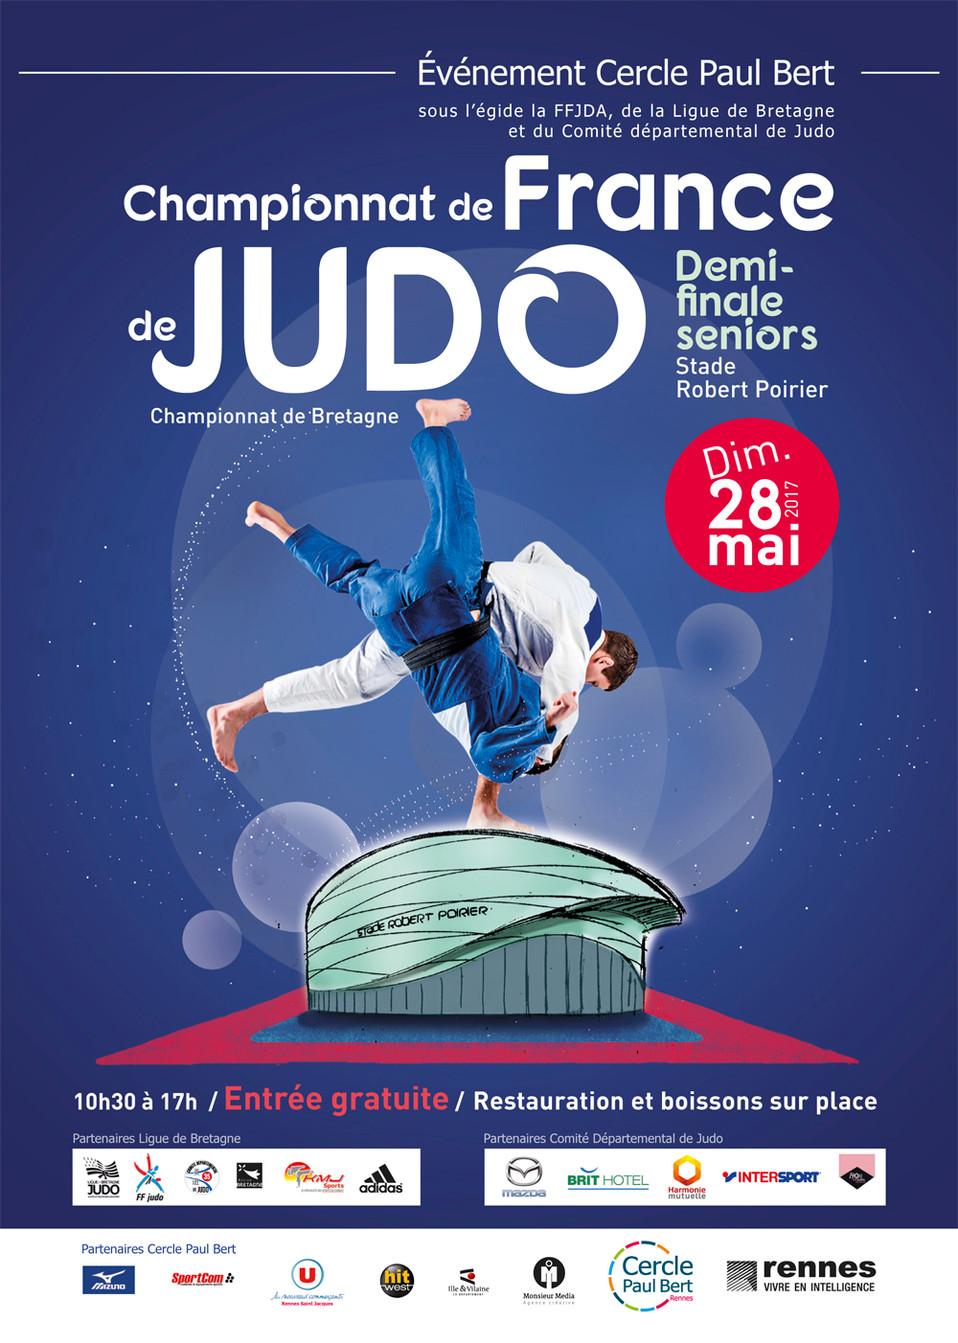 A5-judorectohd.jpg